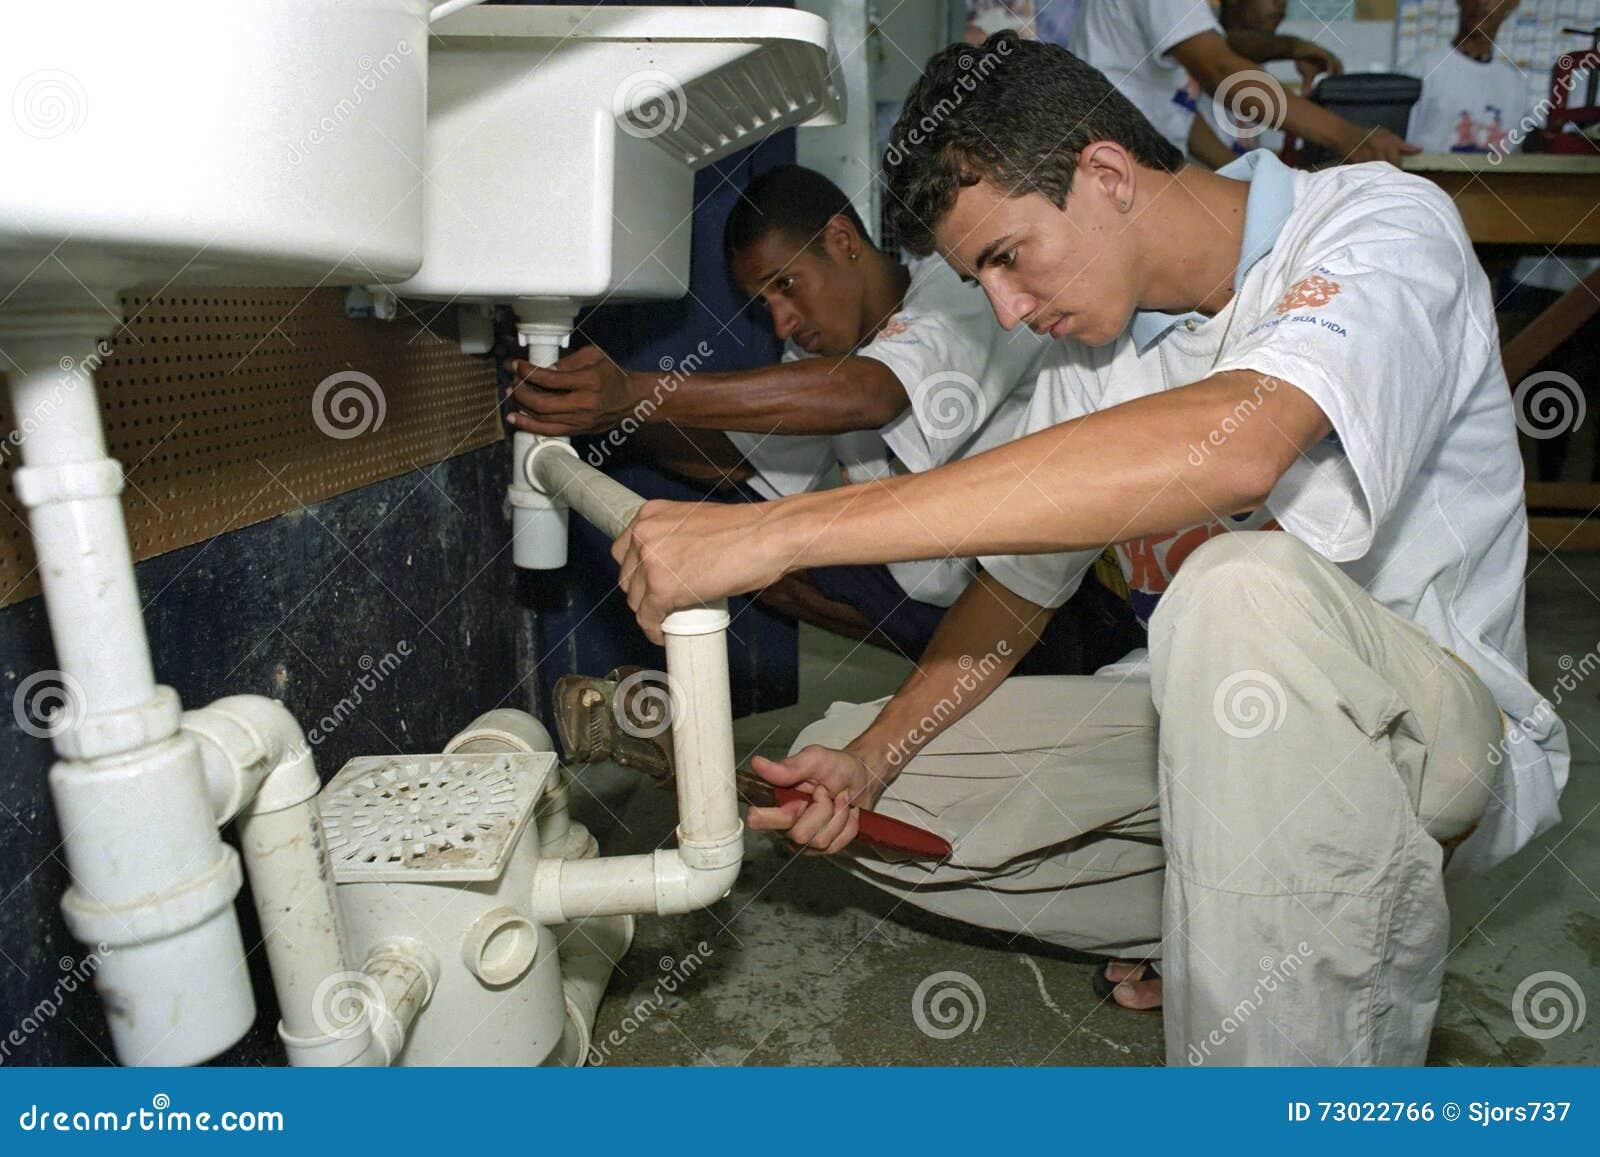 nyc plumbing com with school bcctl